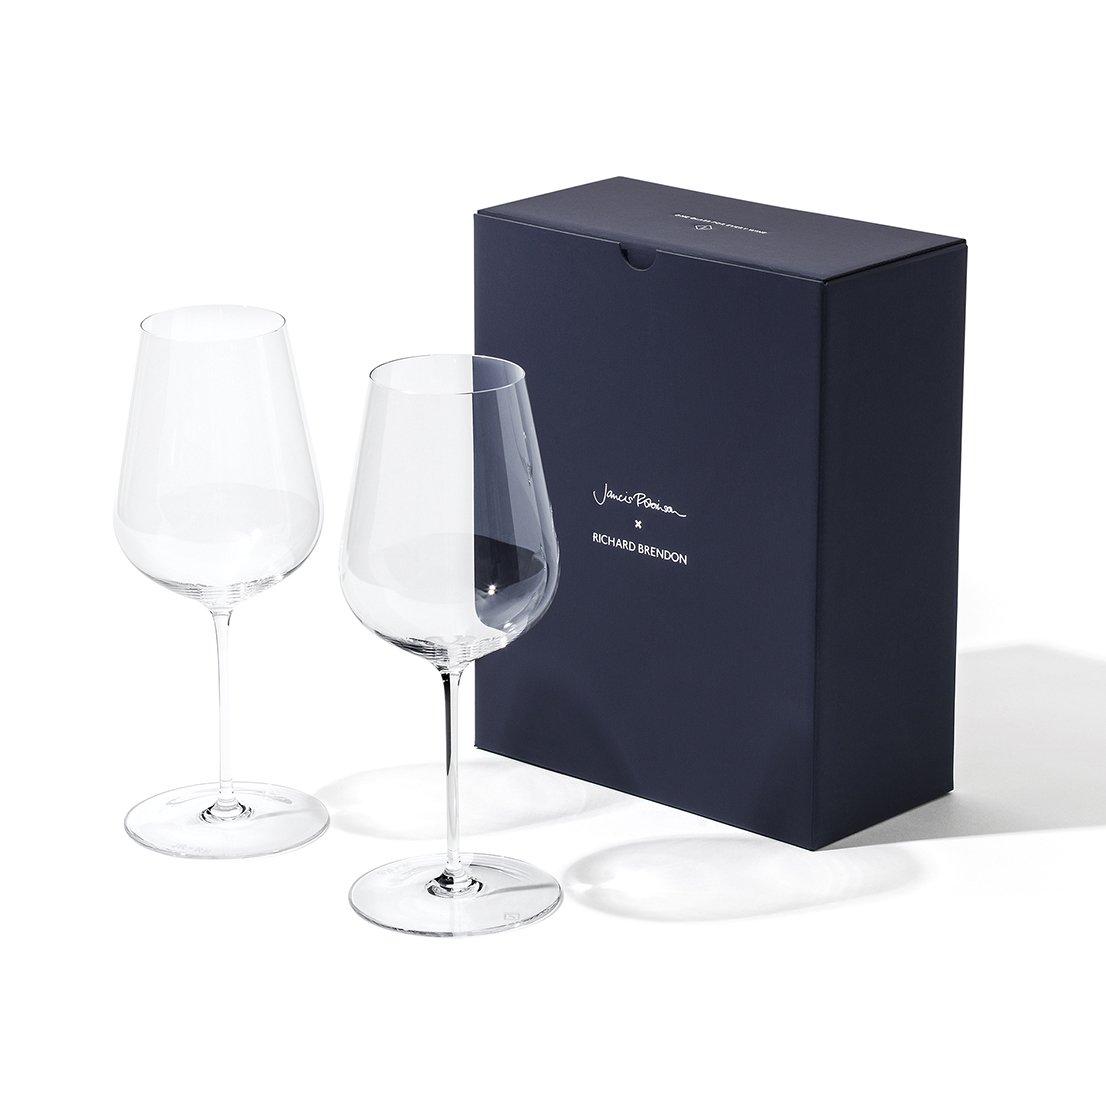 The Wine Glass Set of 2